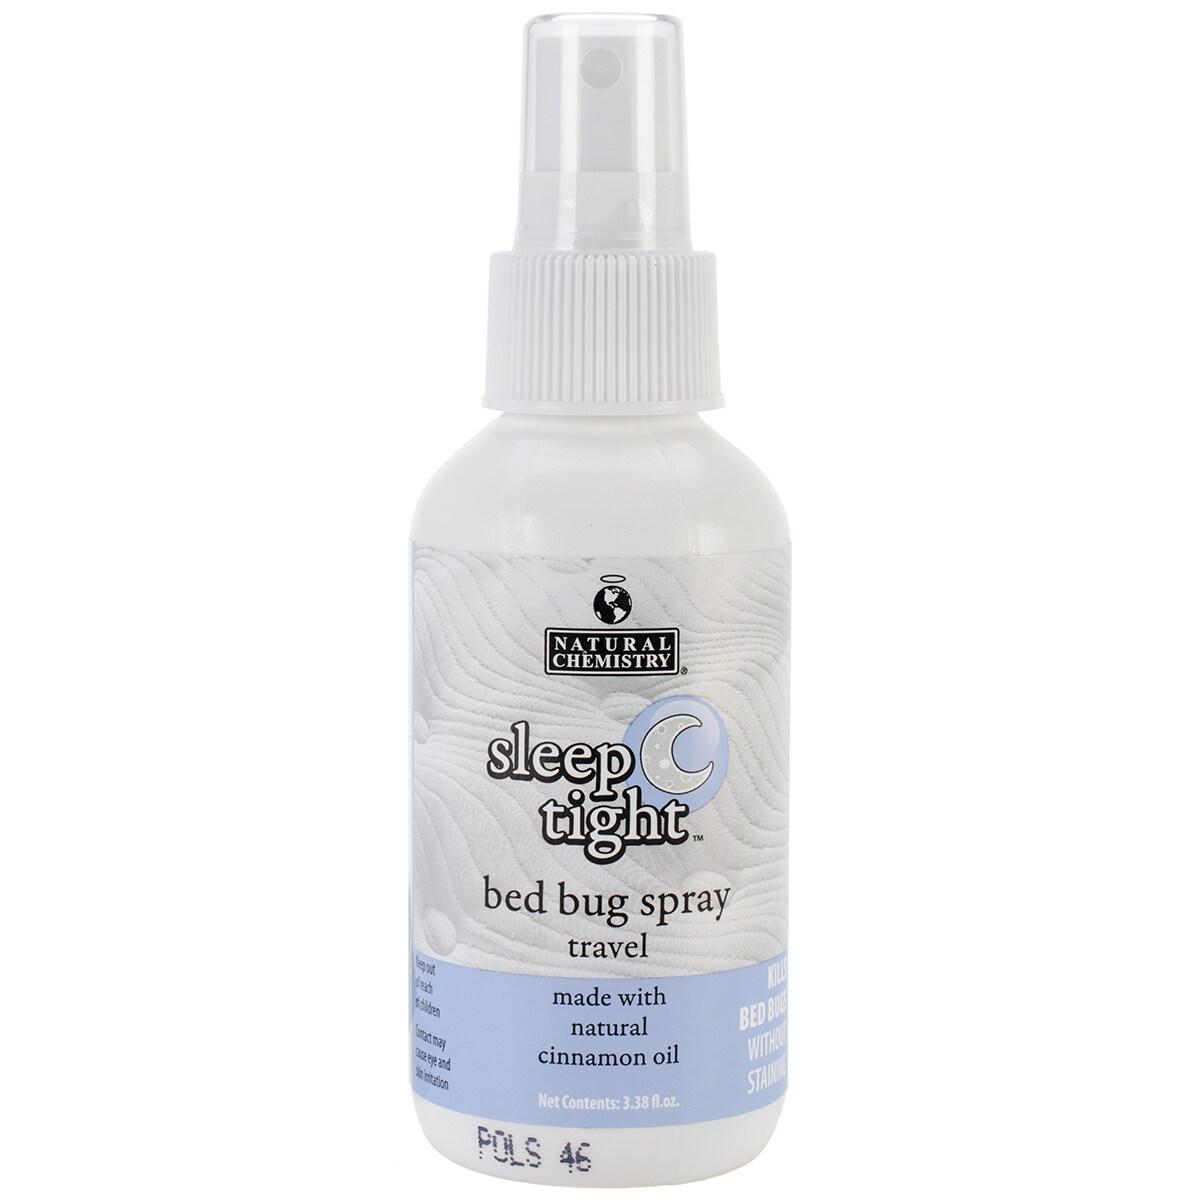 Natural Chemistry Sleep Tight Bed Bug Spray -Travel Size ...